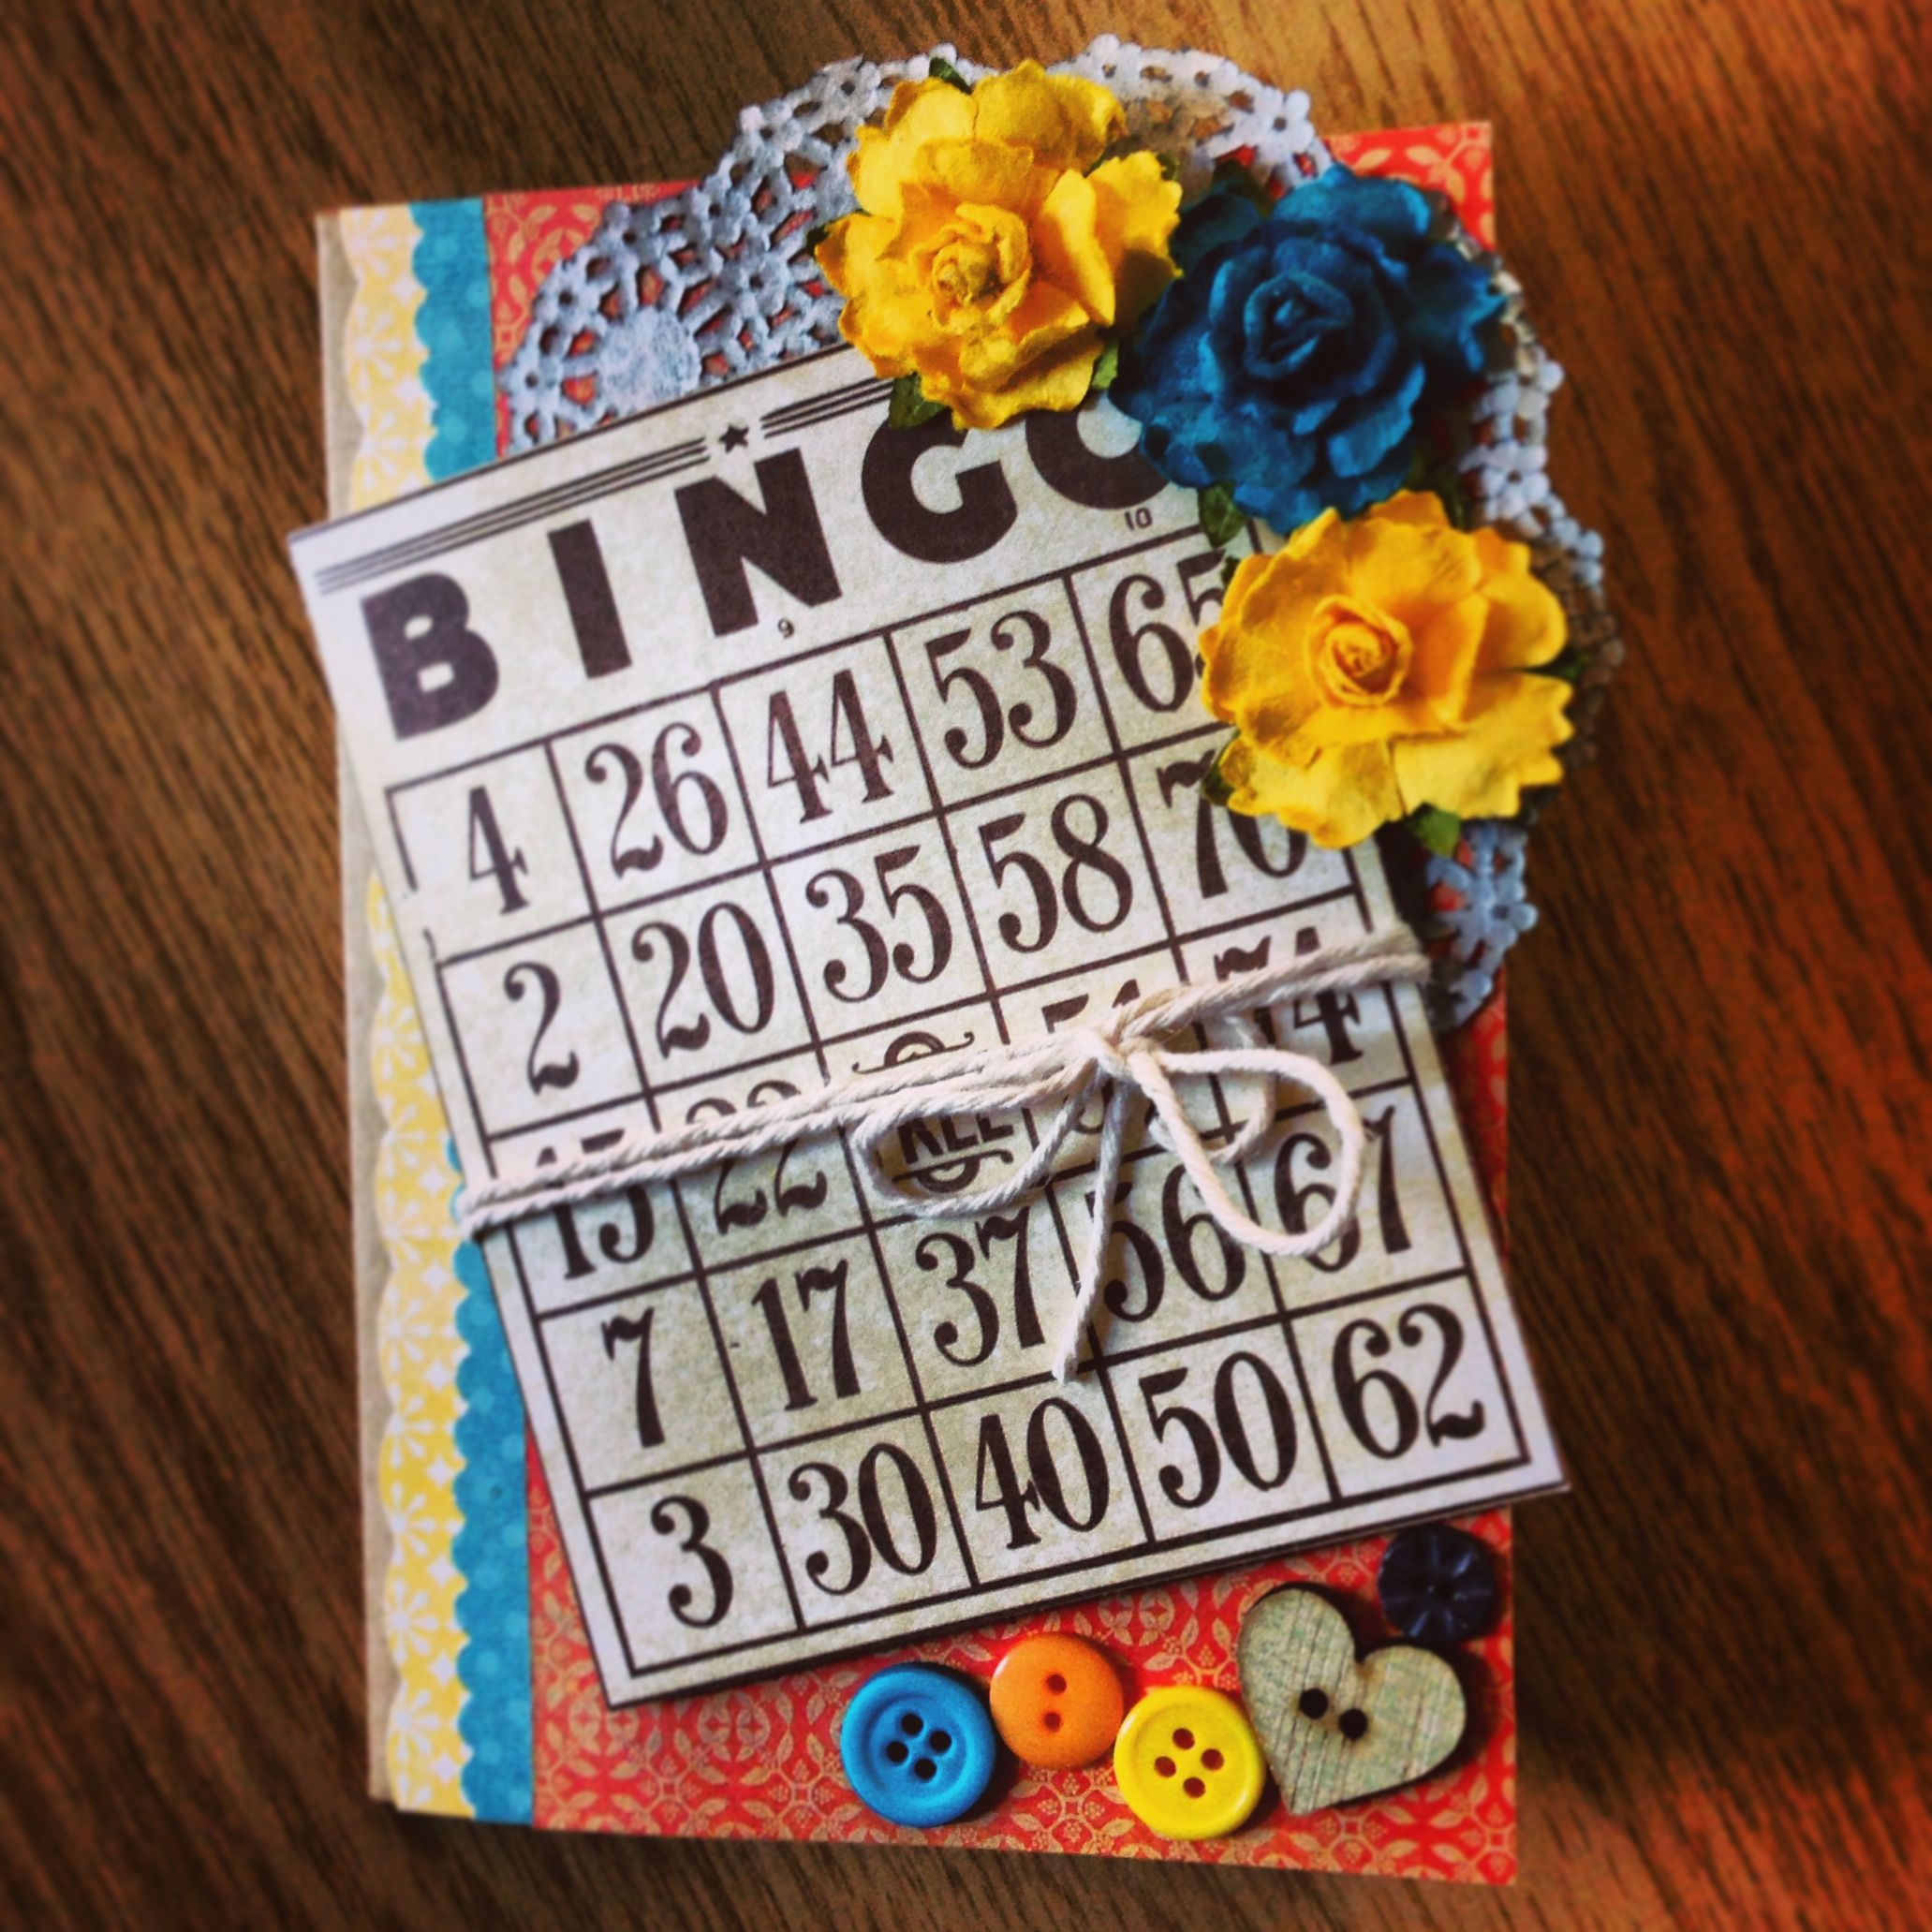 Lovely Vintage Birthday Card For A Bingo Lover Creative Handmade Unusualcards For More Bingo Fun Join Vintage Birthday Cards Birthday Cards Cards Handmade